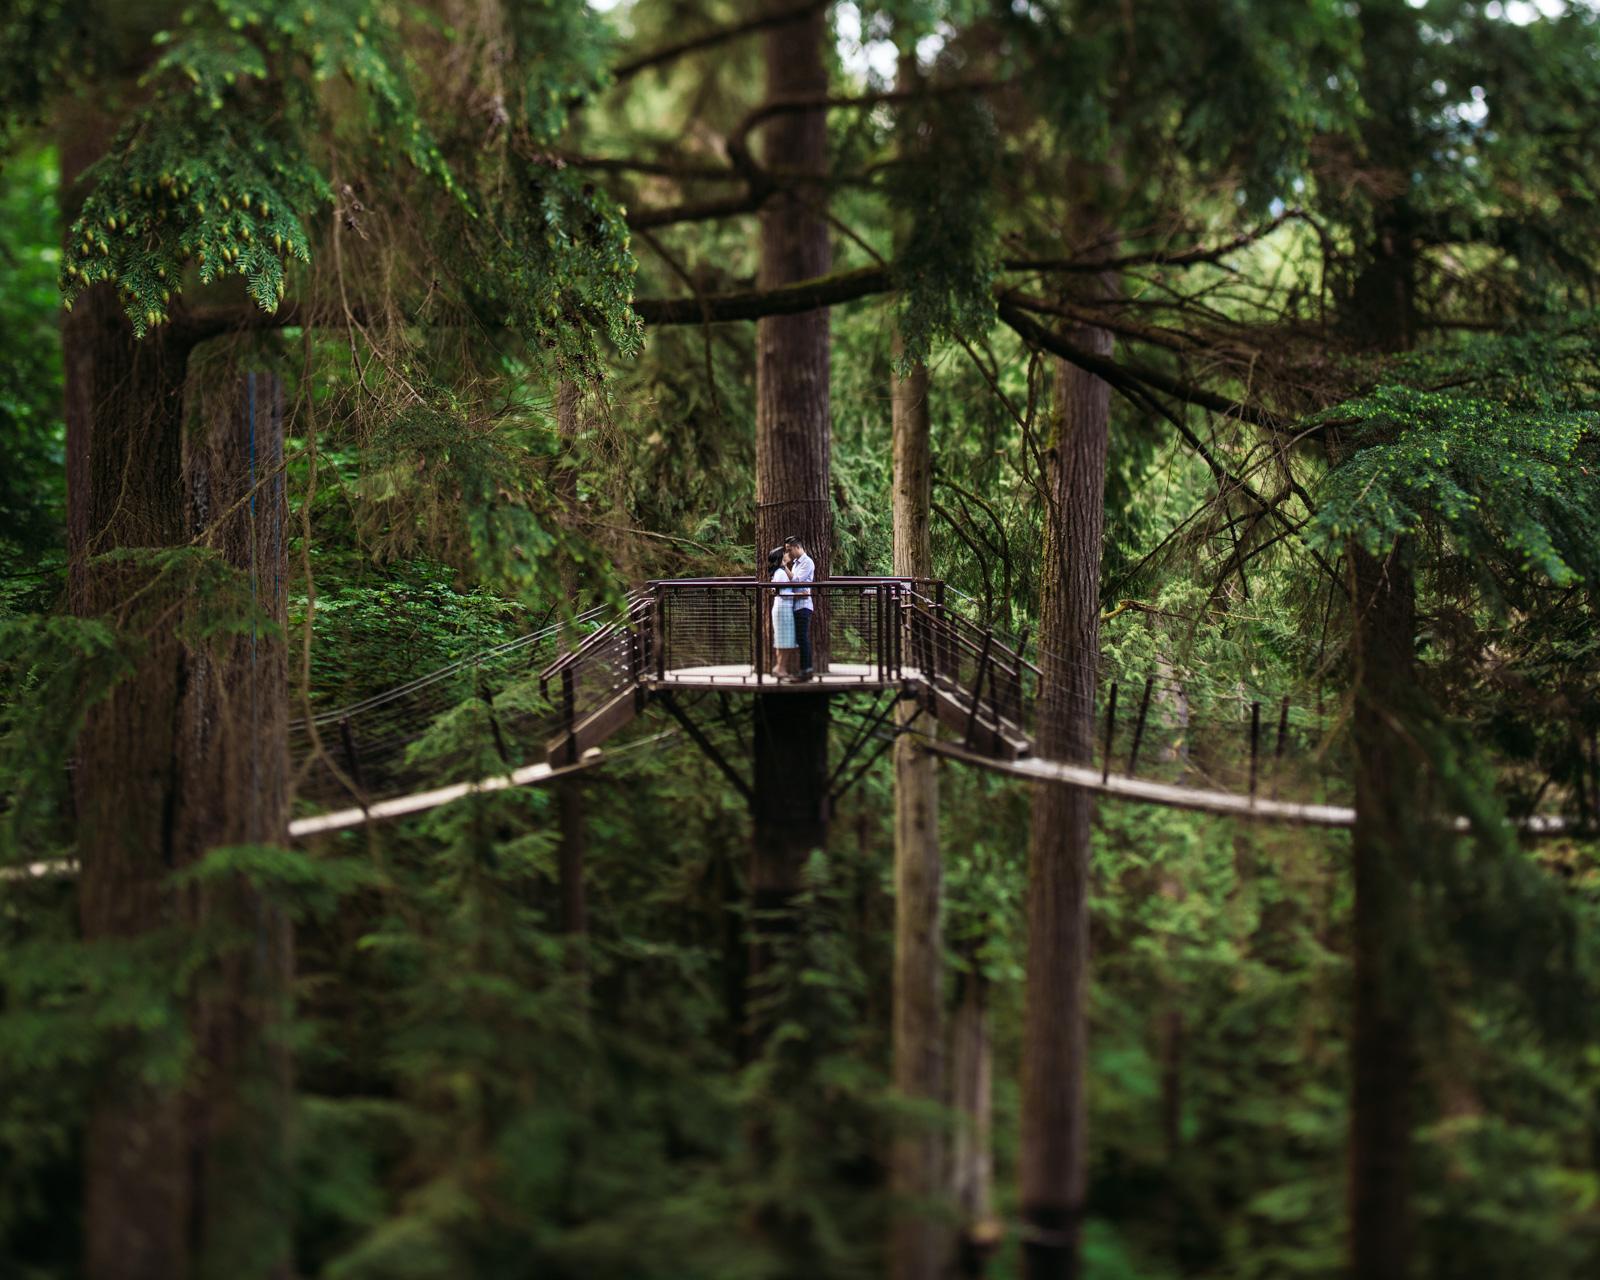 vancouver-island-wedding-photographers-capilano-suspension-bridge-engagement-16.jpg